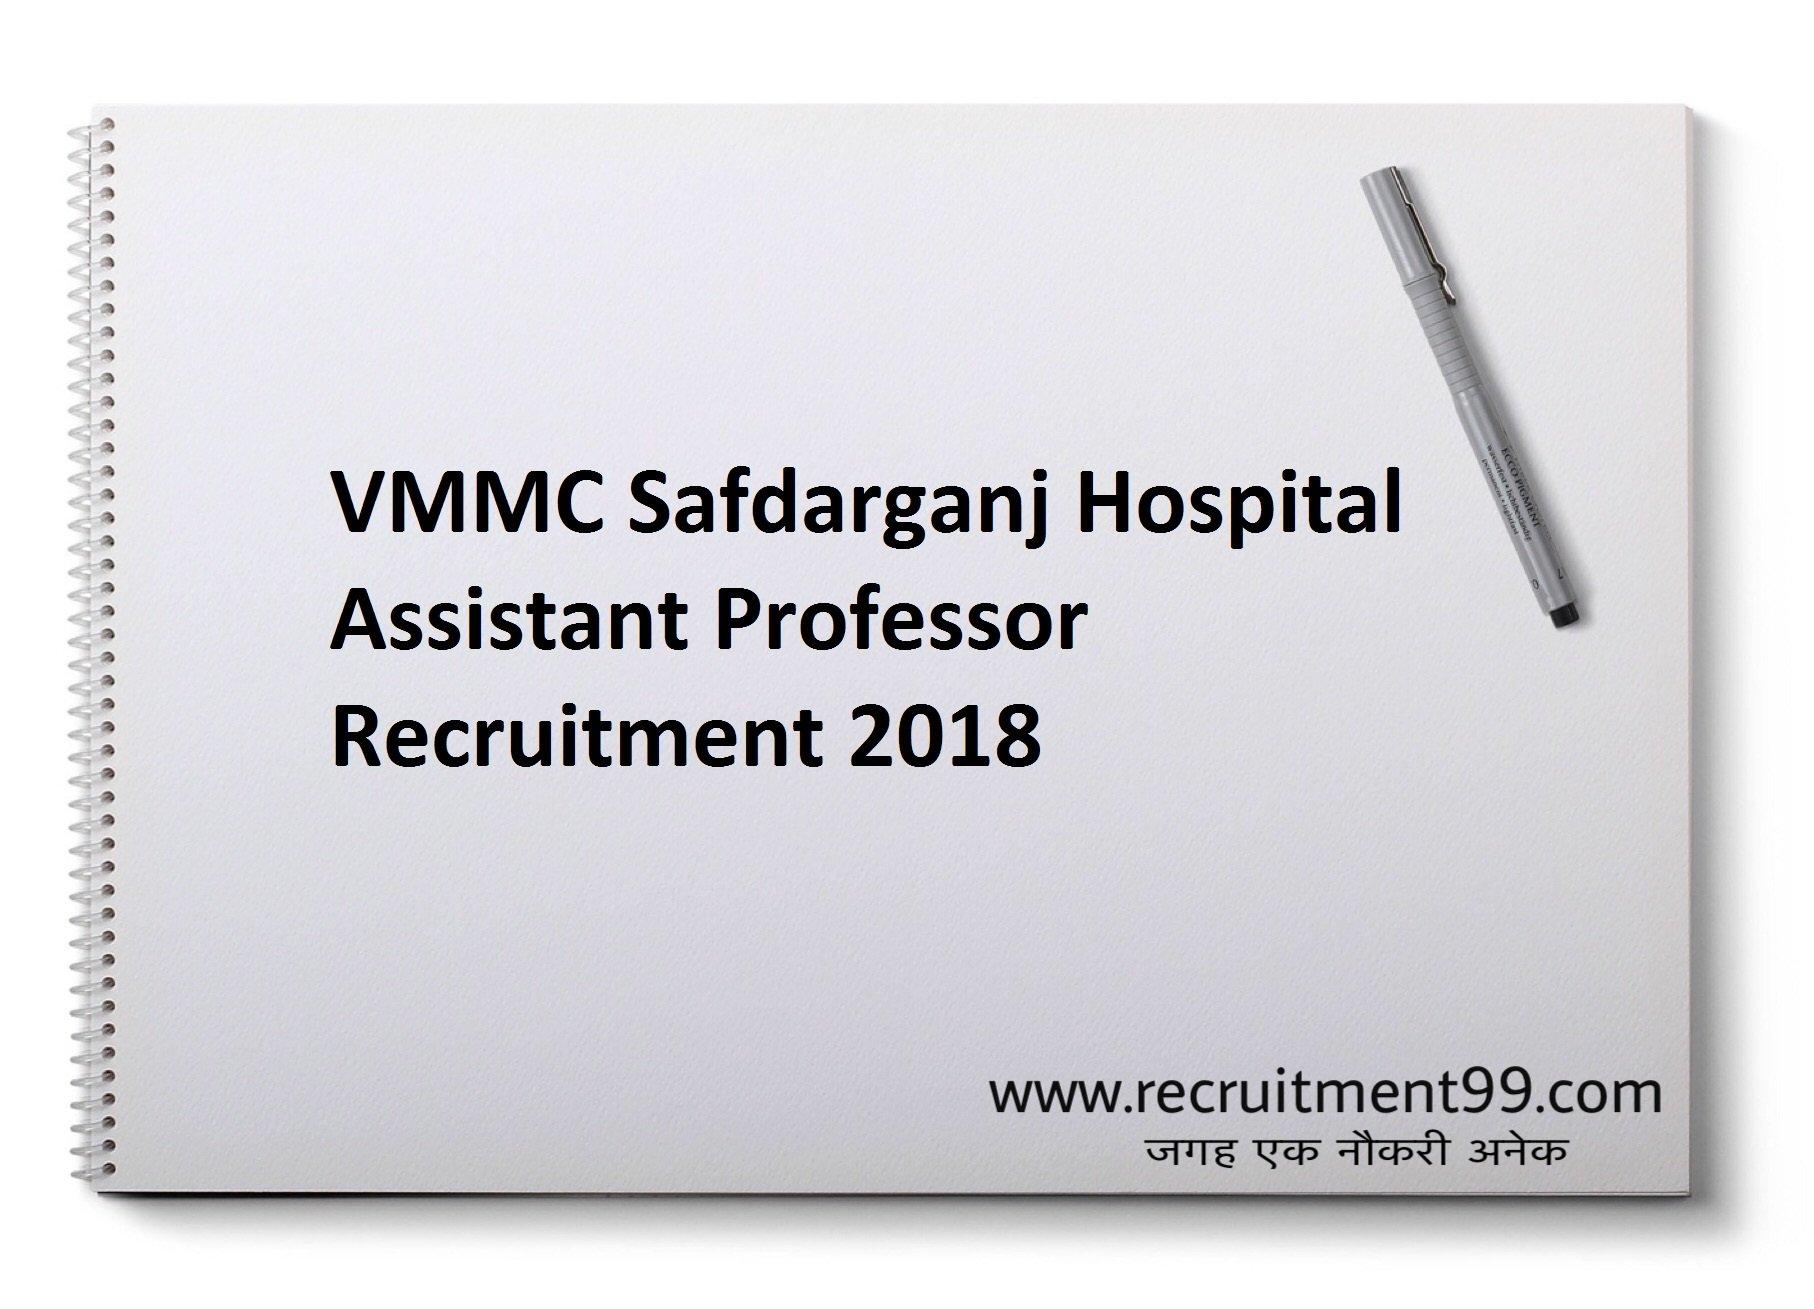 VMMC Safdarganj Hospital Assistant Professor Recruitment Admit Card Result 2018